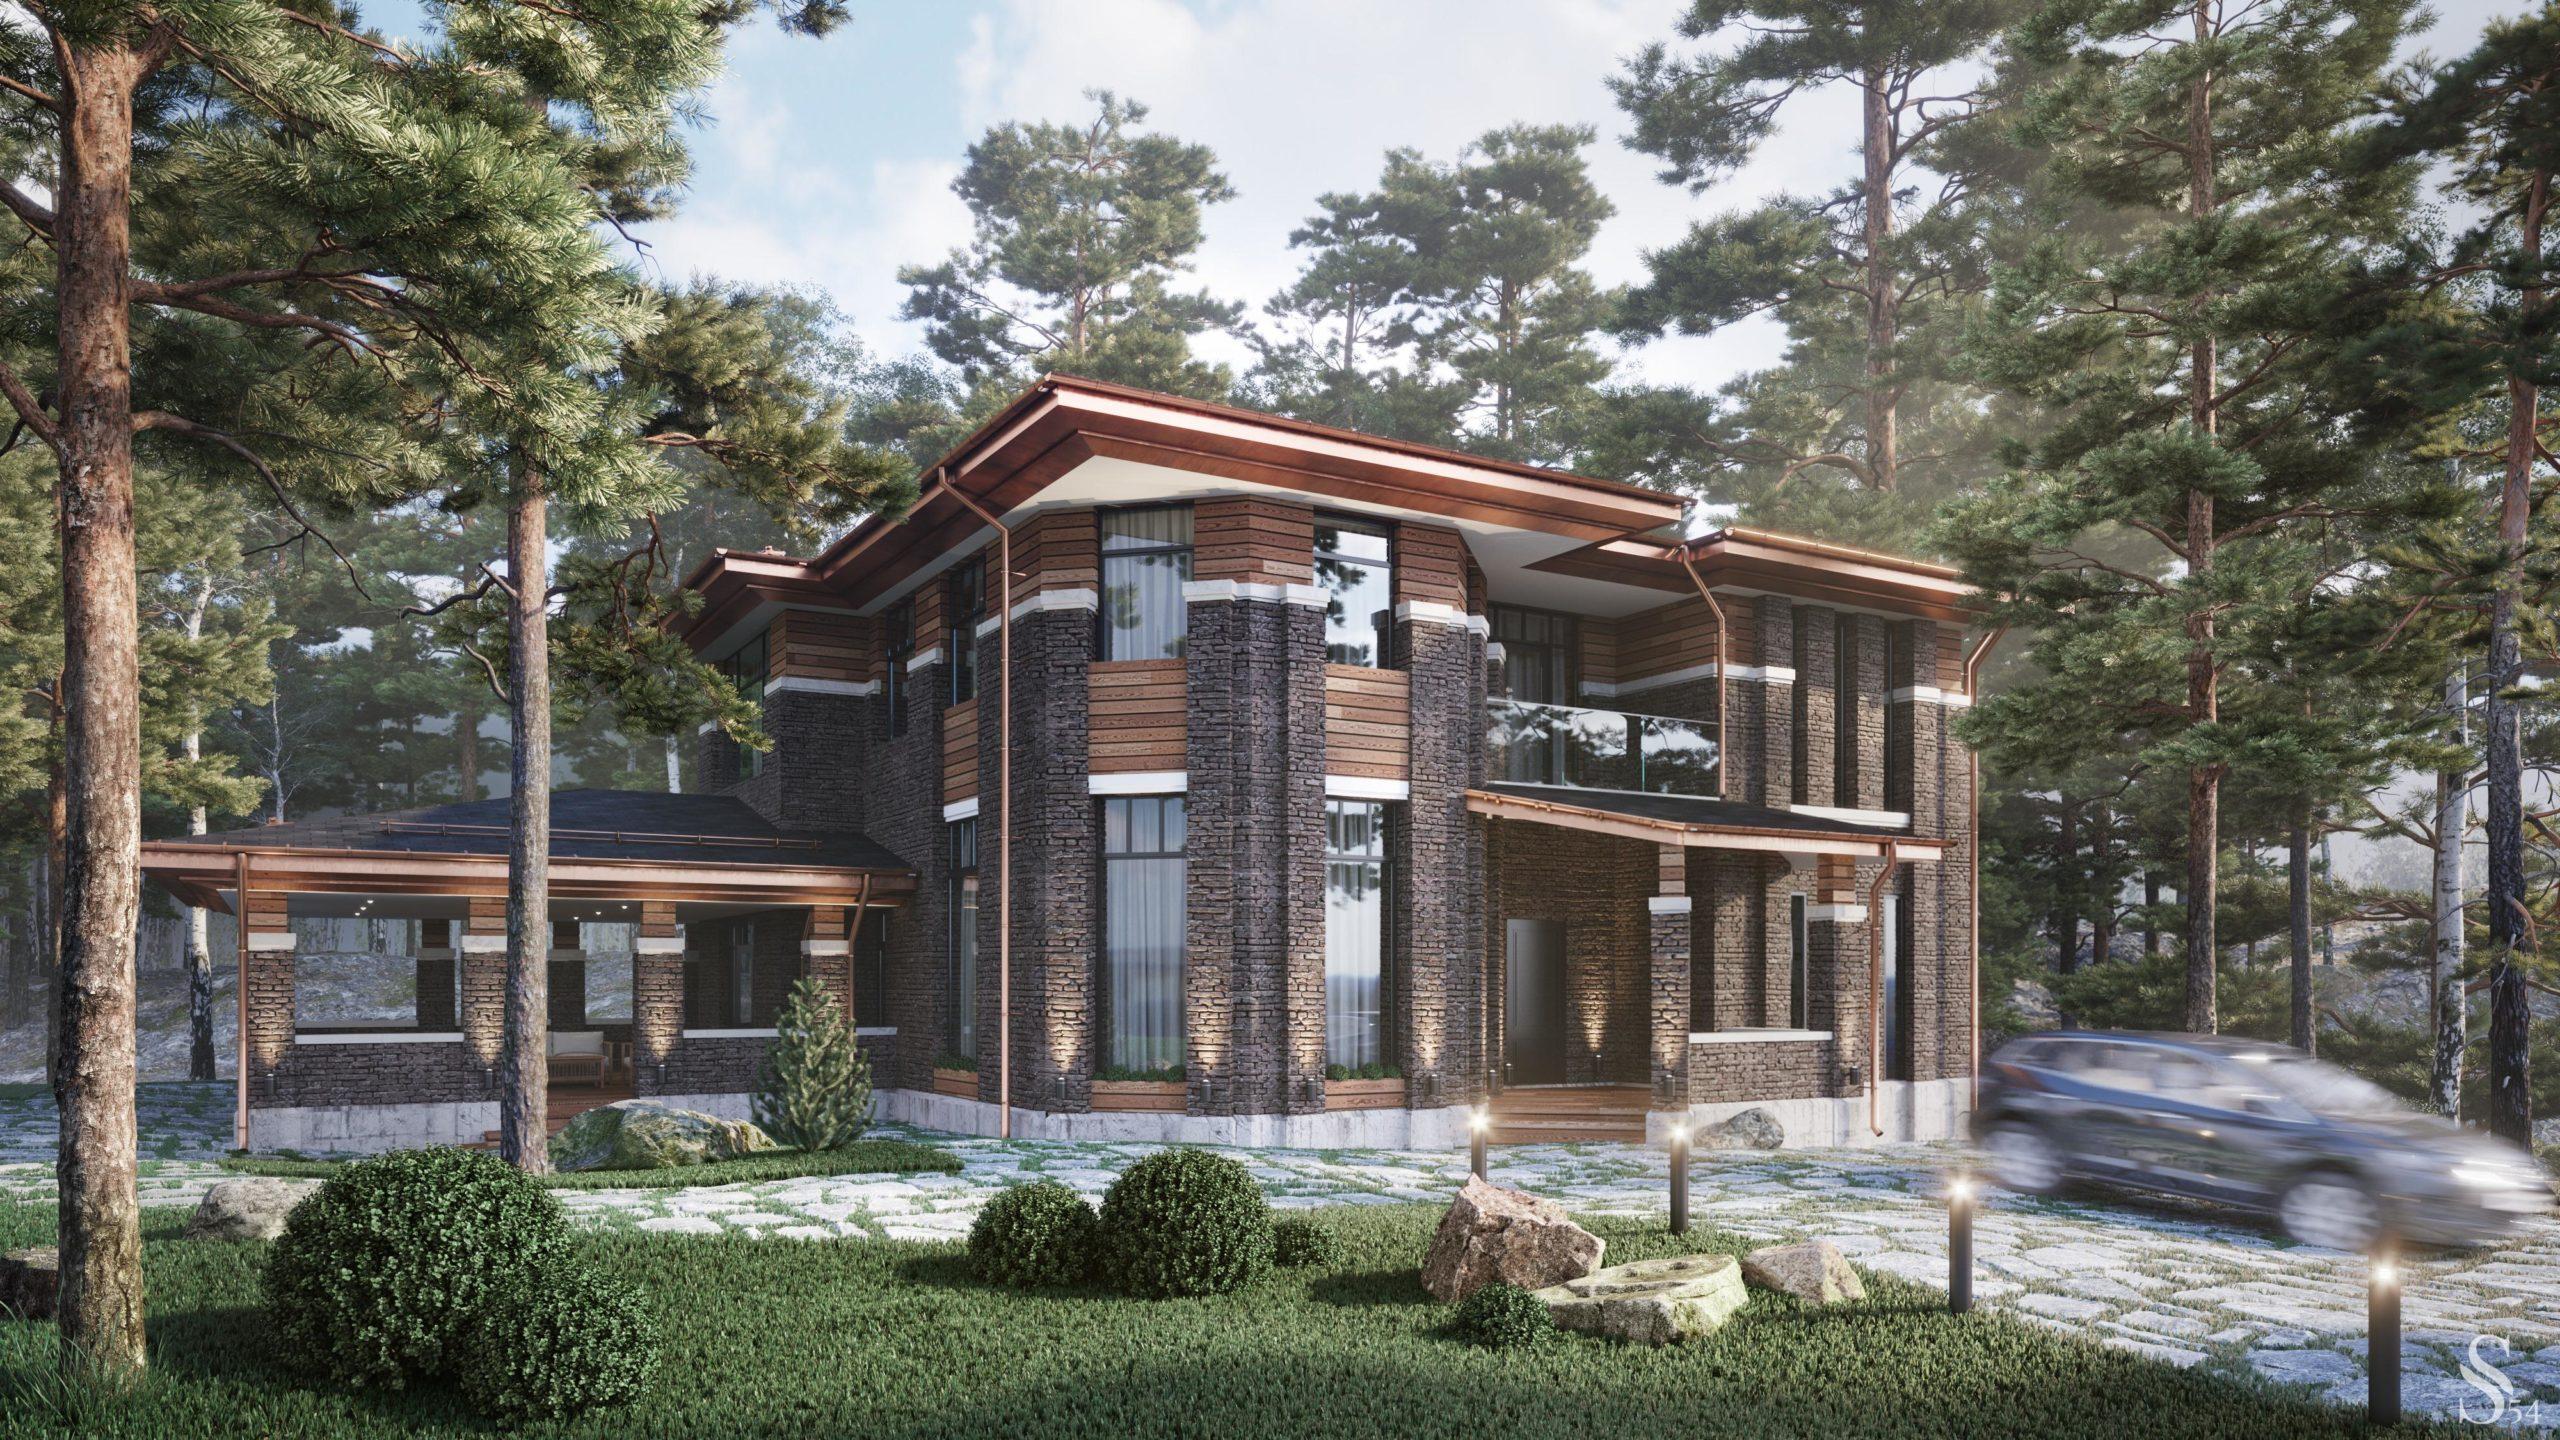 проект дома из газобетона Парквэй строительство под ключ за от 6 490 000 руб.  рублей